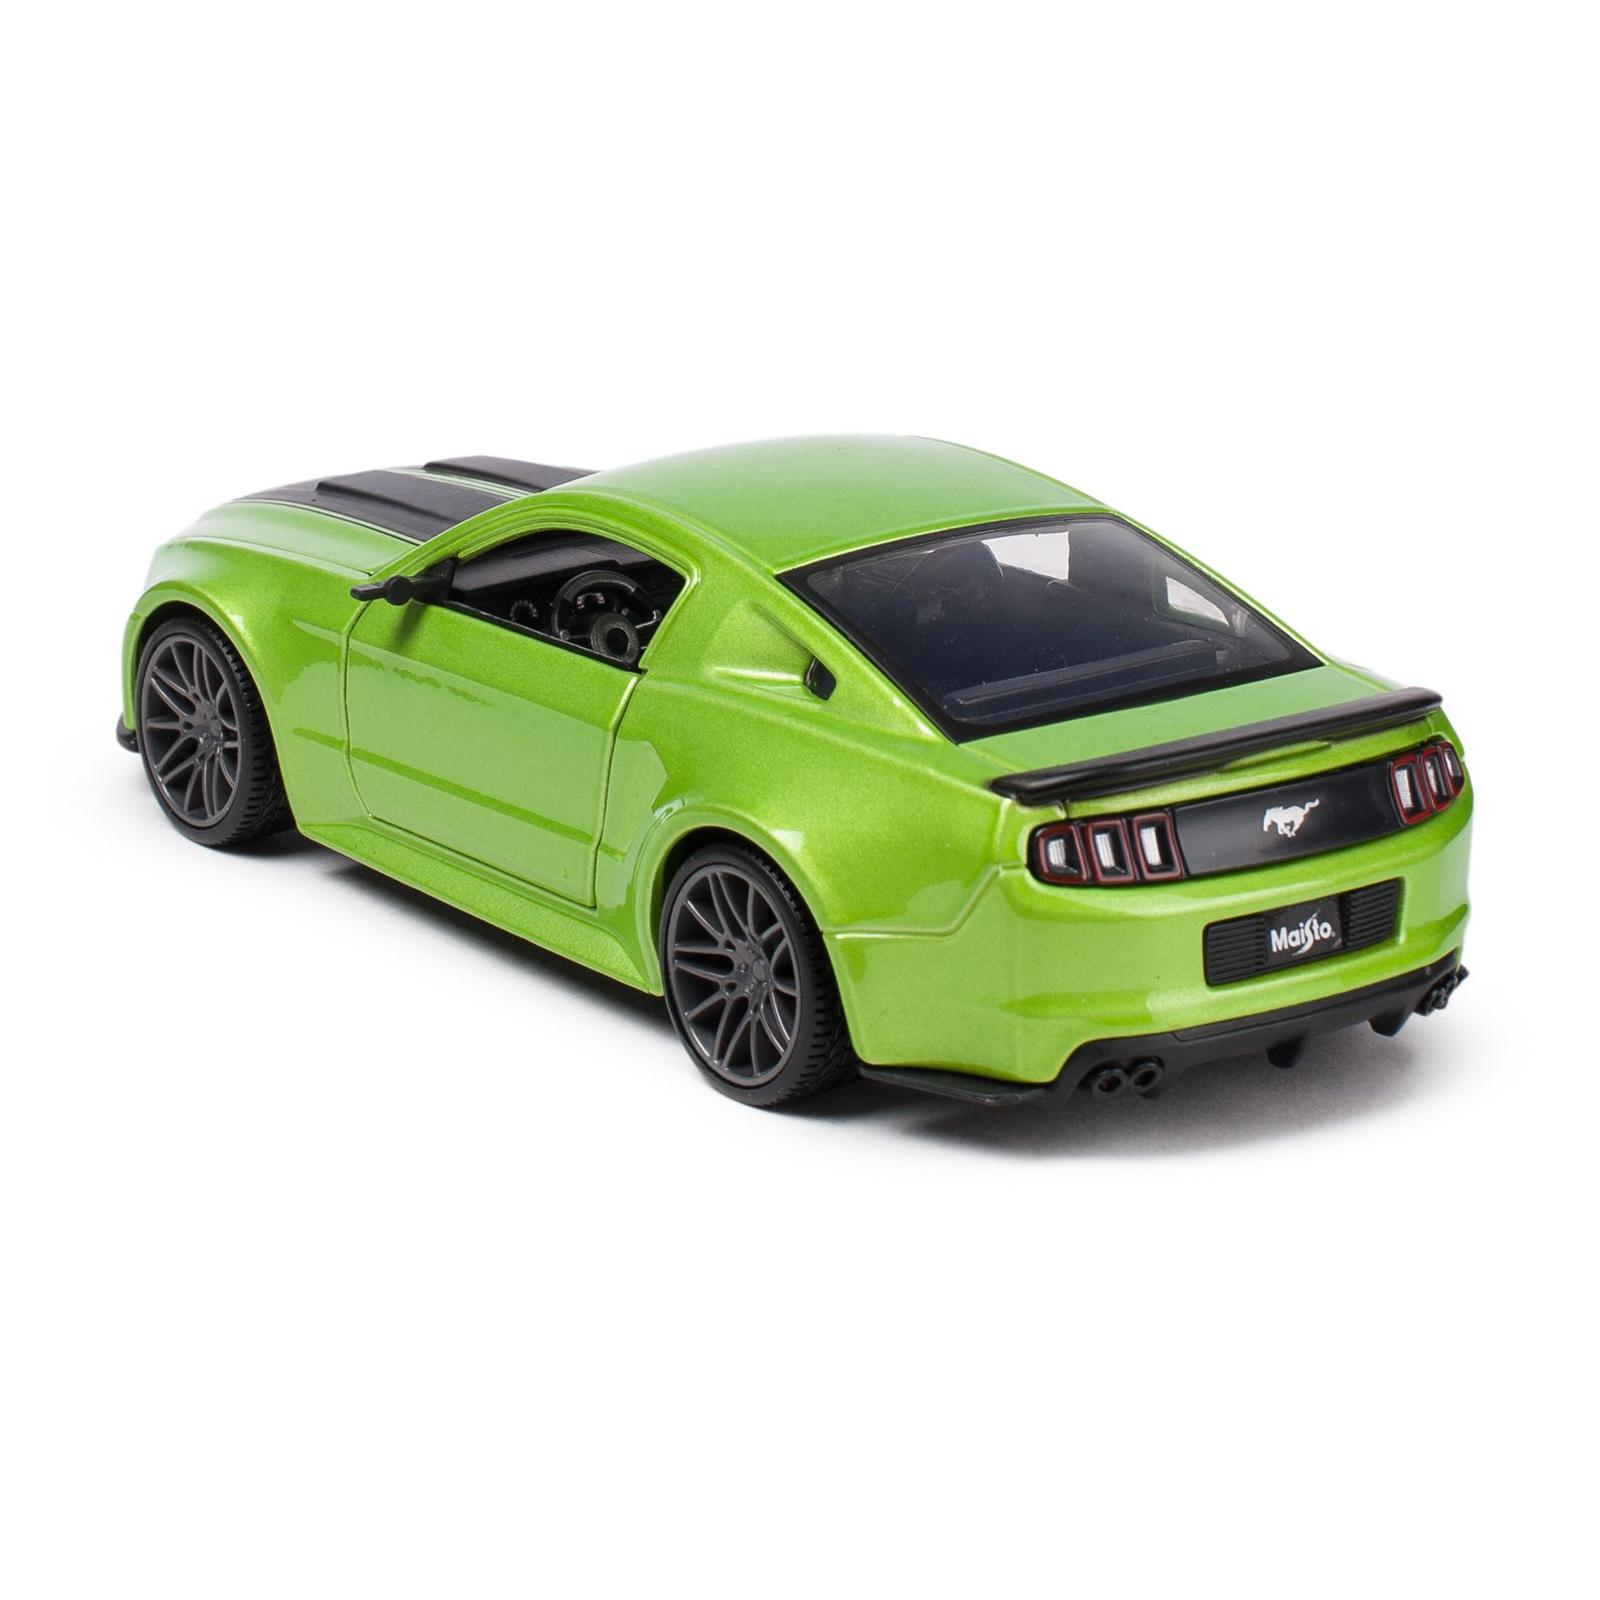 Машина Maisto Ford Mustang Street Racer 2014 (1:24) зеленый металлик (31506 met. green) изображение 2